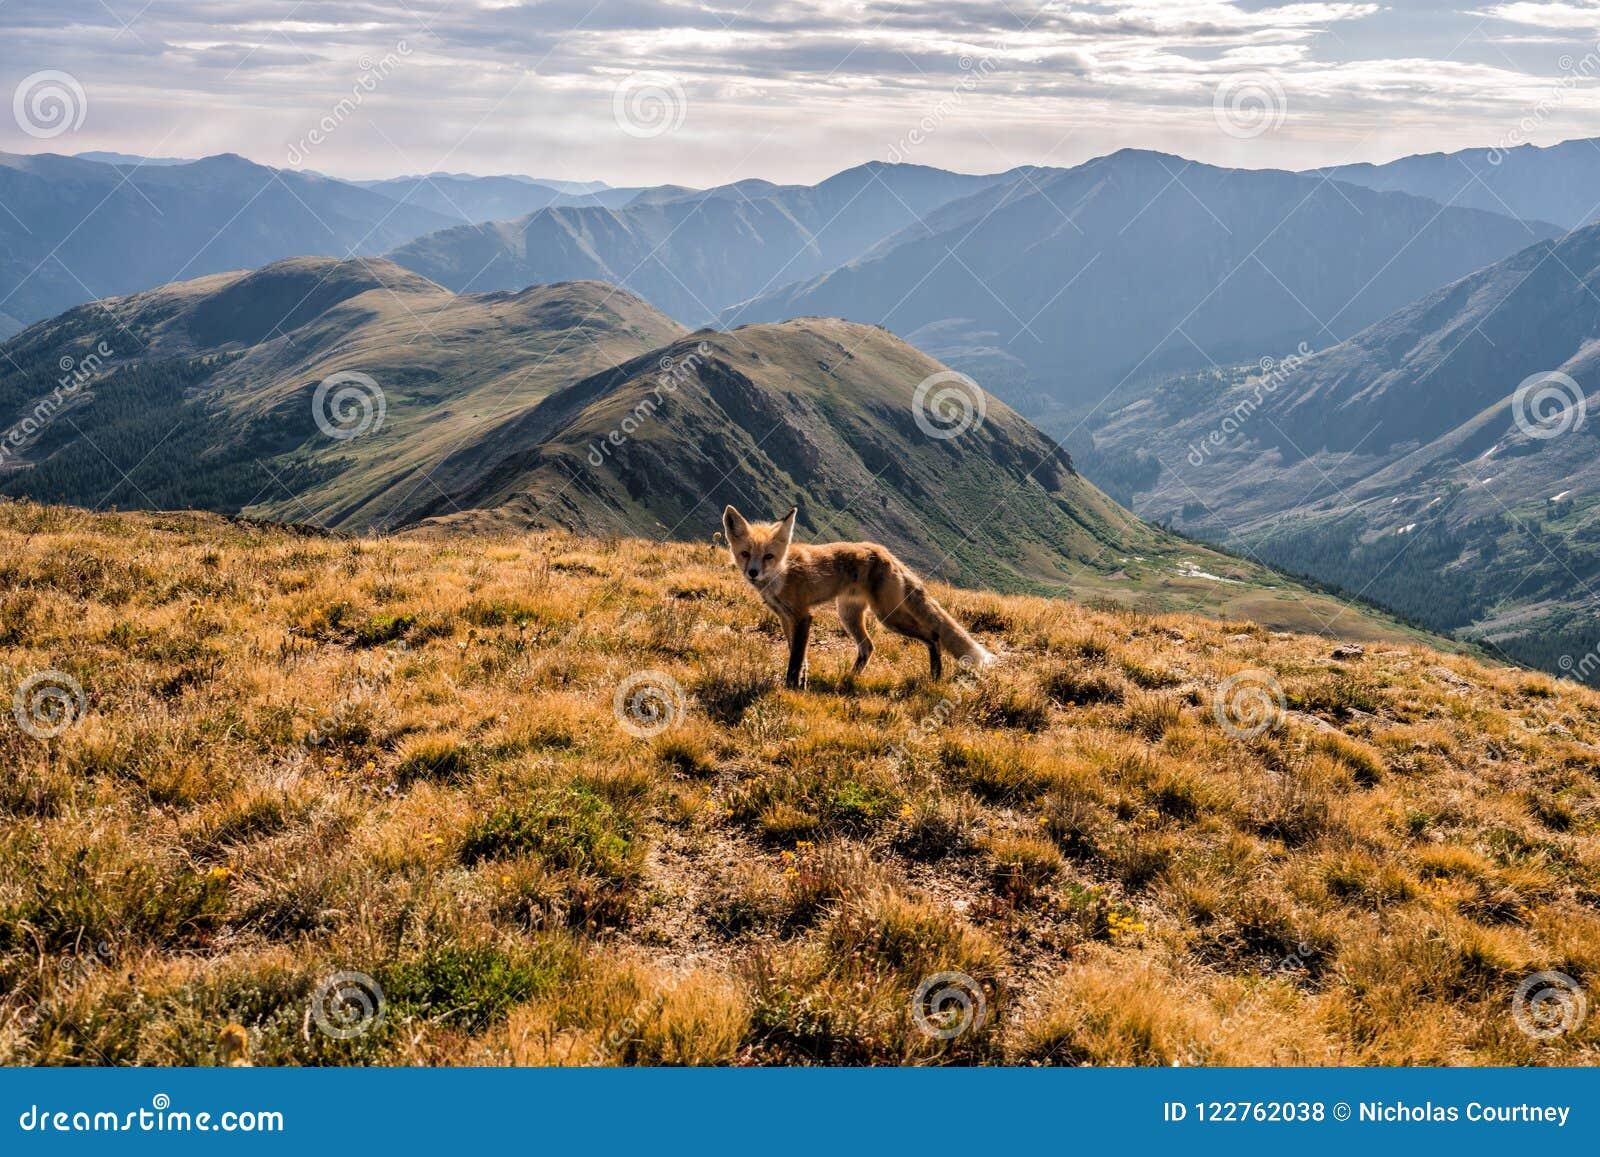 A fox on the summit of Cupid Peak. Loveland Pass, Colorado Rocky Mountains